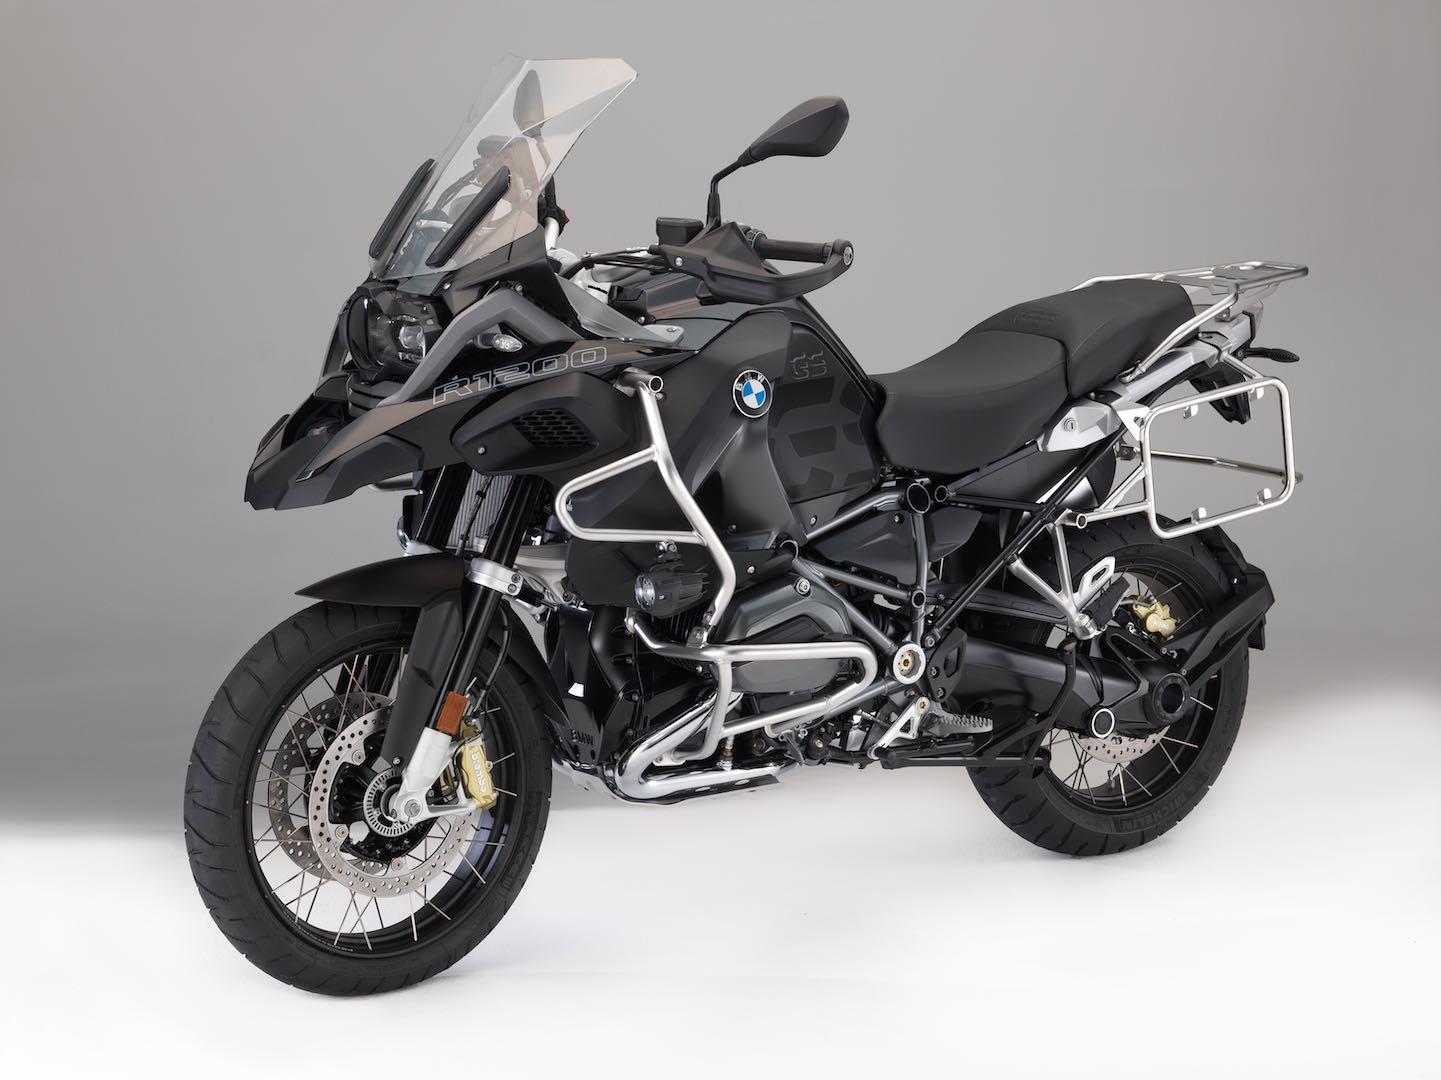 2018 BMW R 1200 GS Adventure: Black